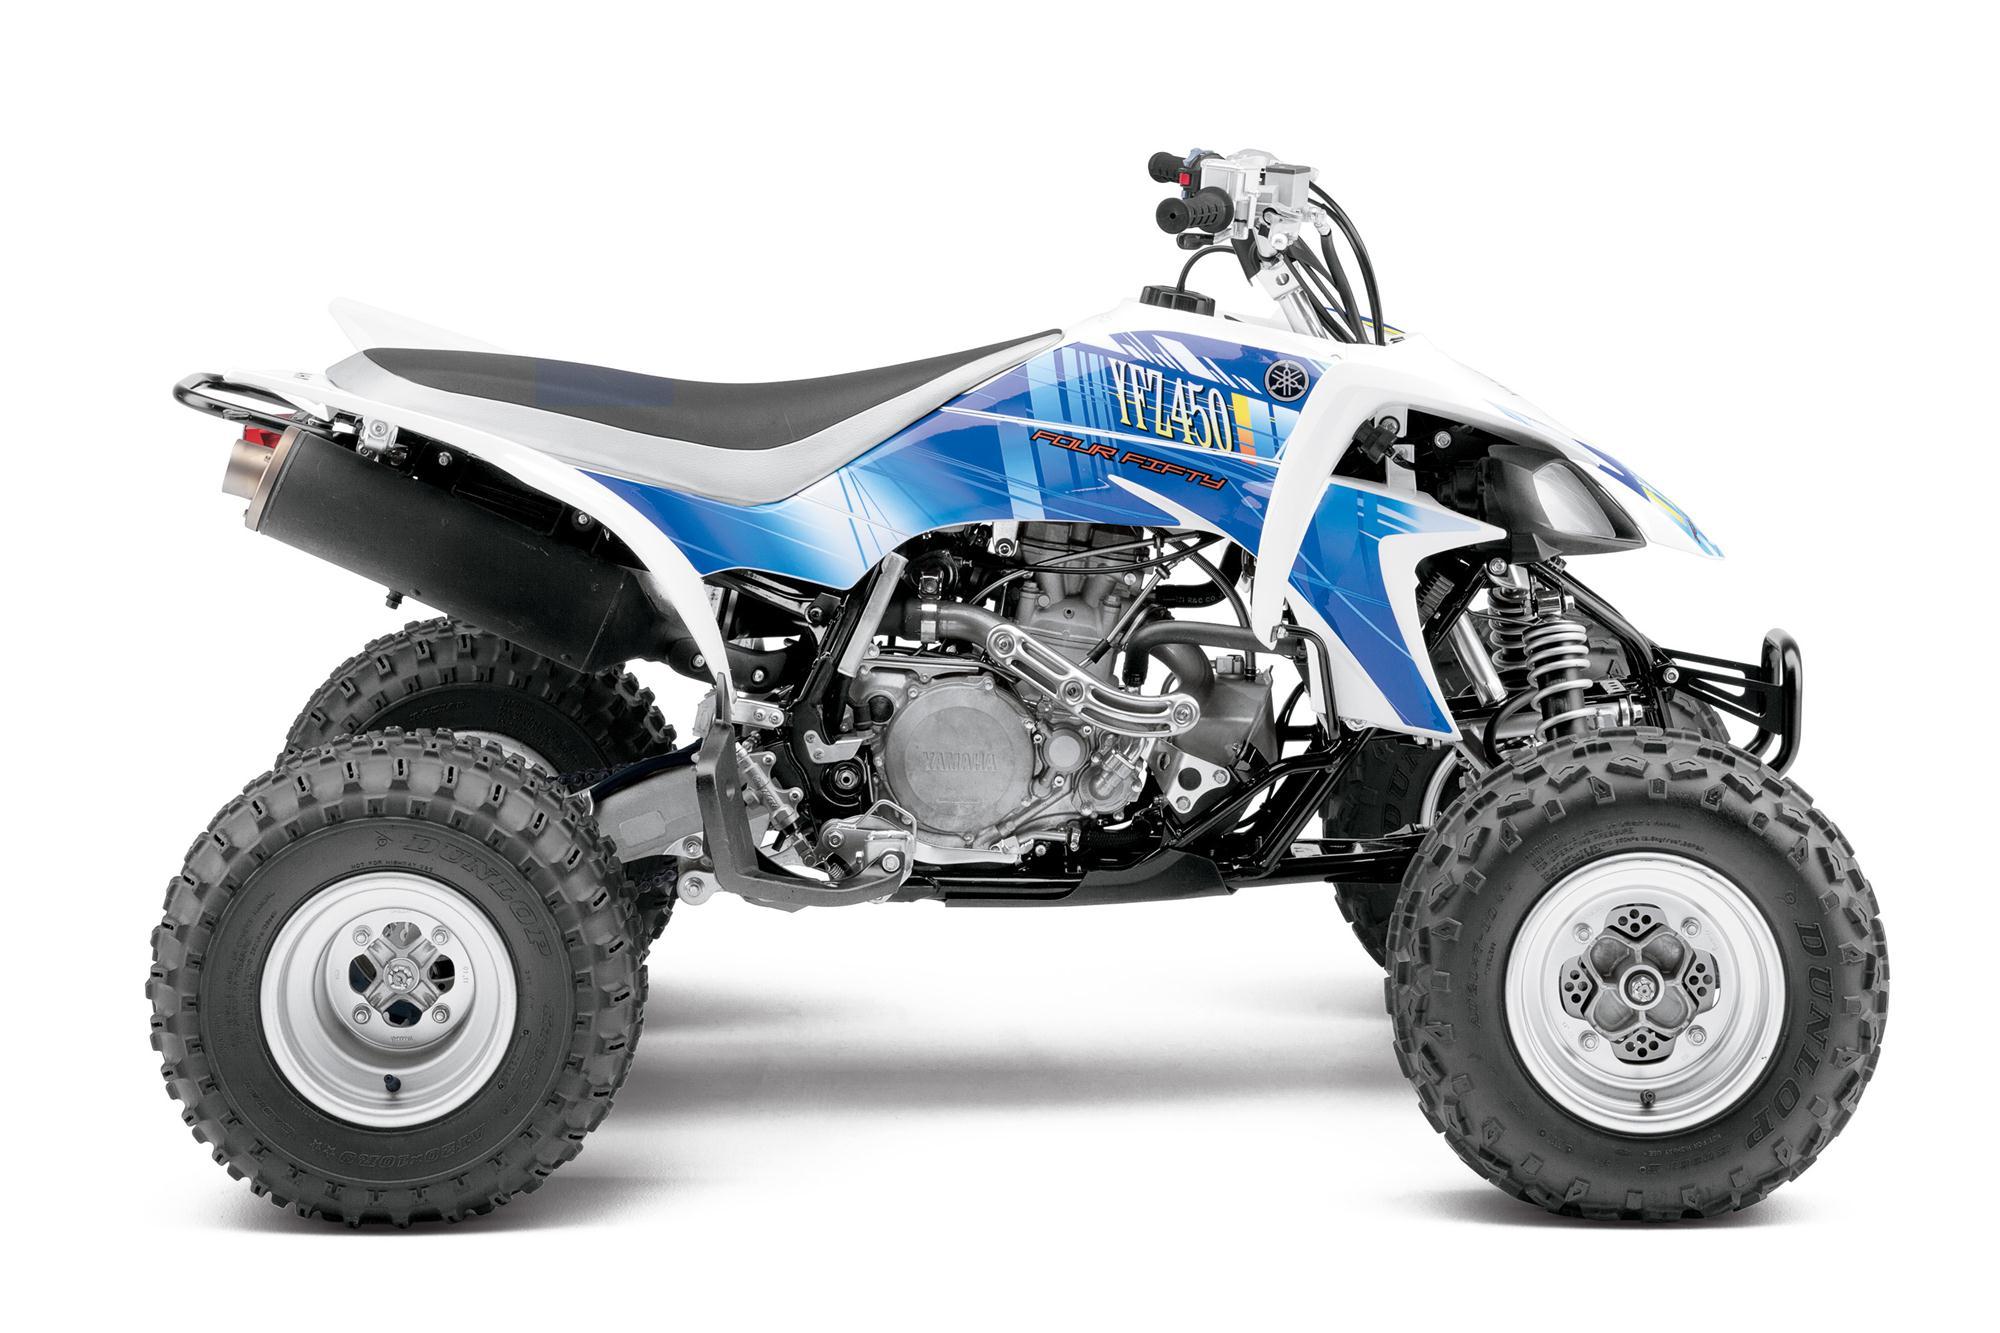 2013 Yamaha Yfz450  The Atv Motocross Standard